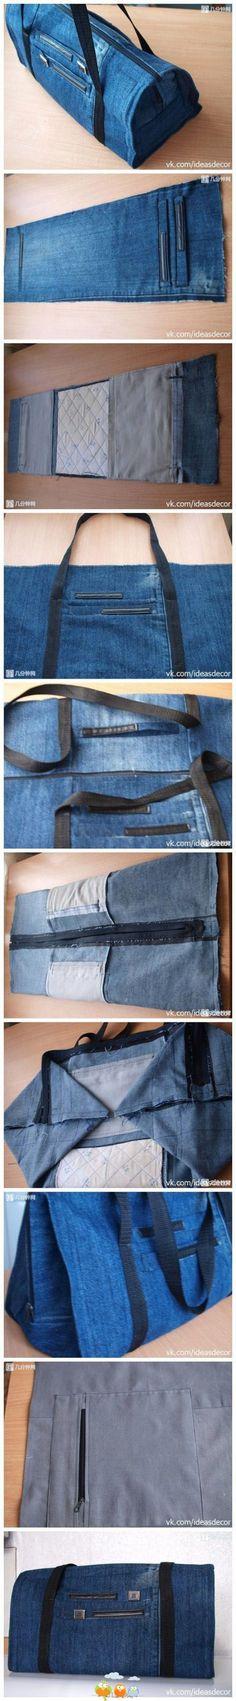 repurpose jeans into a bag